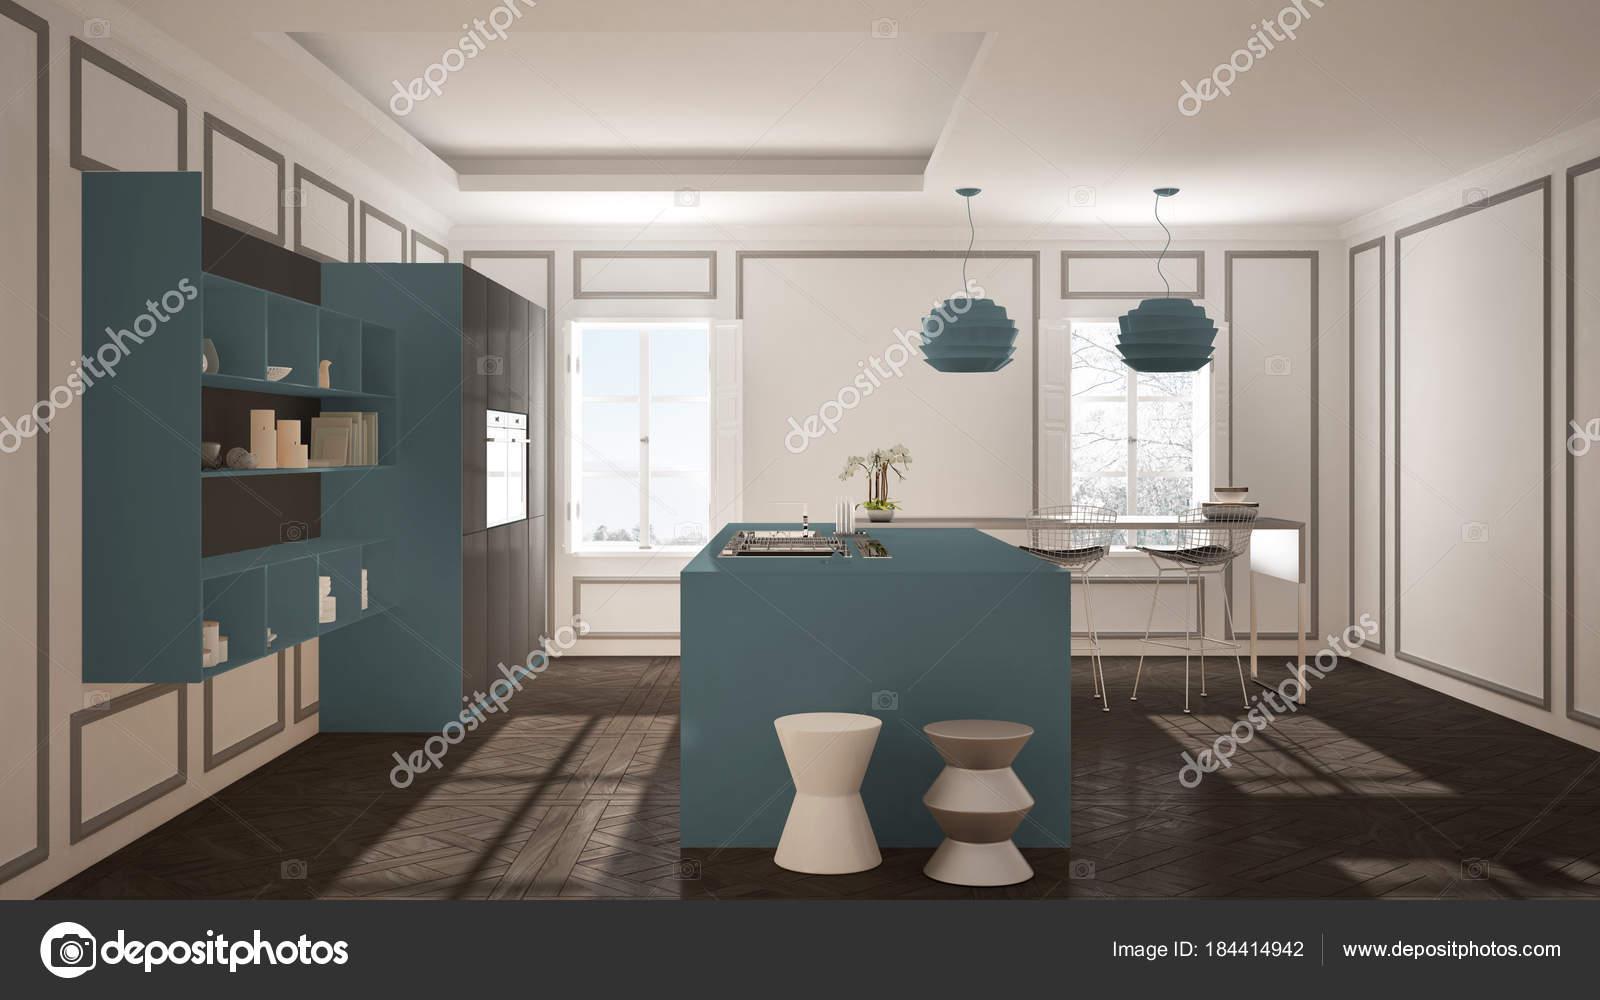 Mobili cucina moderna in camera classic, vecchio parquet, minimalis ...